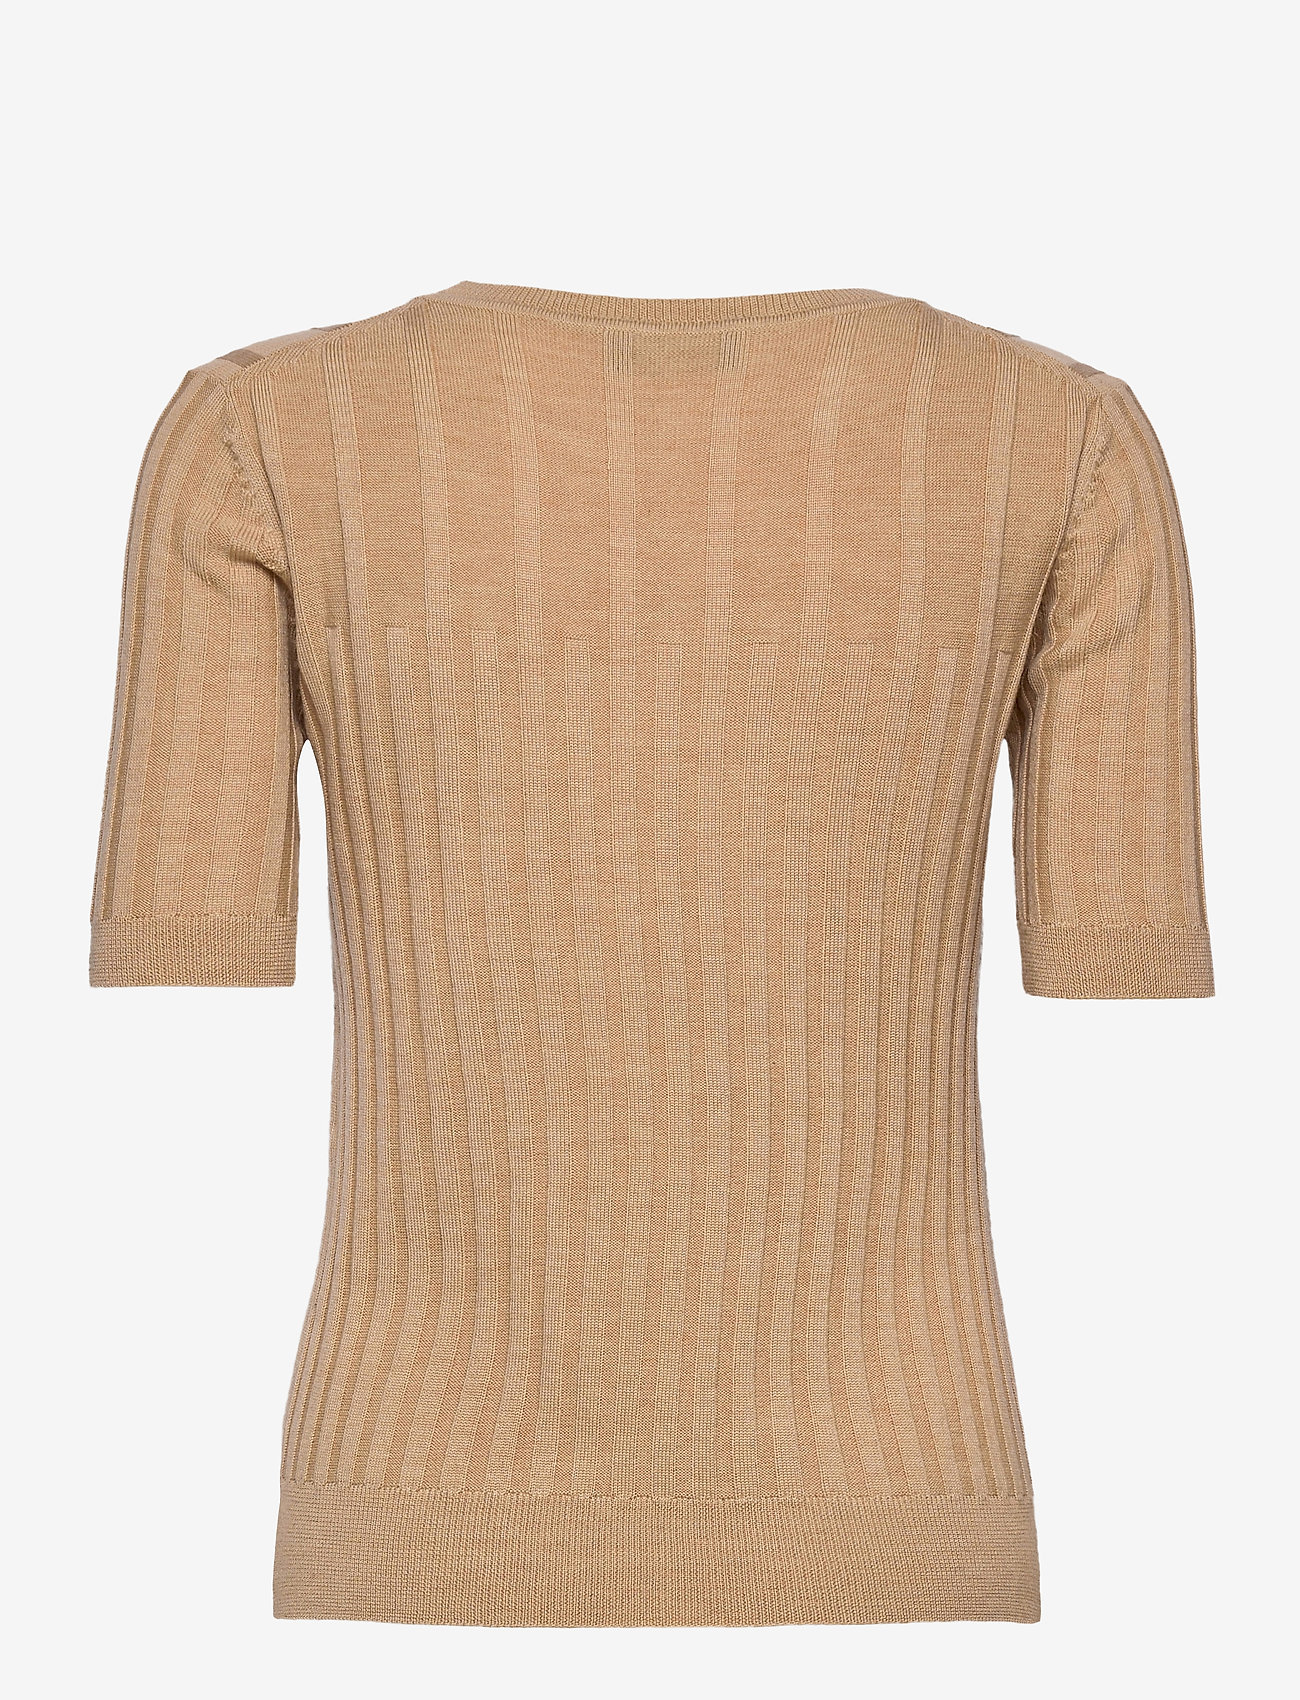 SAND - Fellini F - Leanna - gebreide t-shirts - light camel - 1